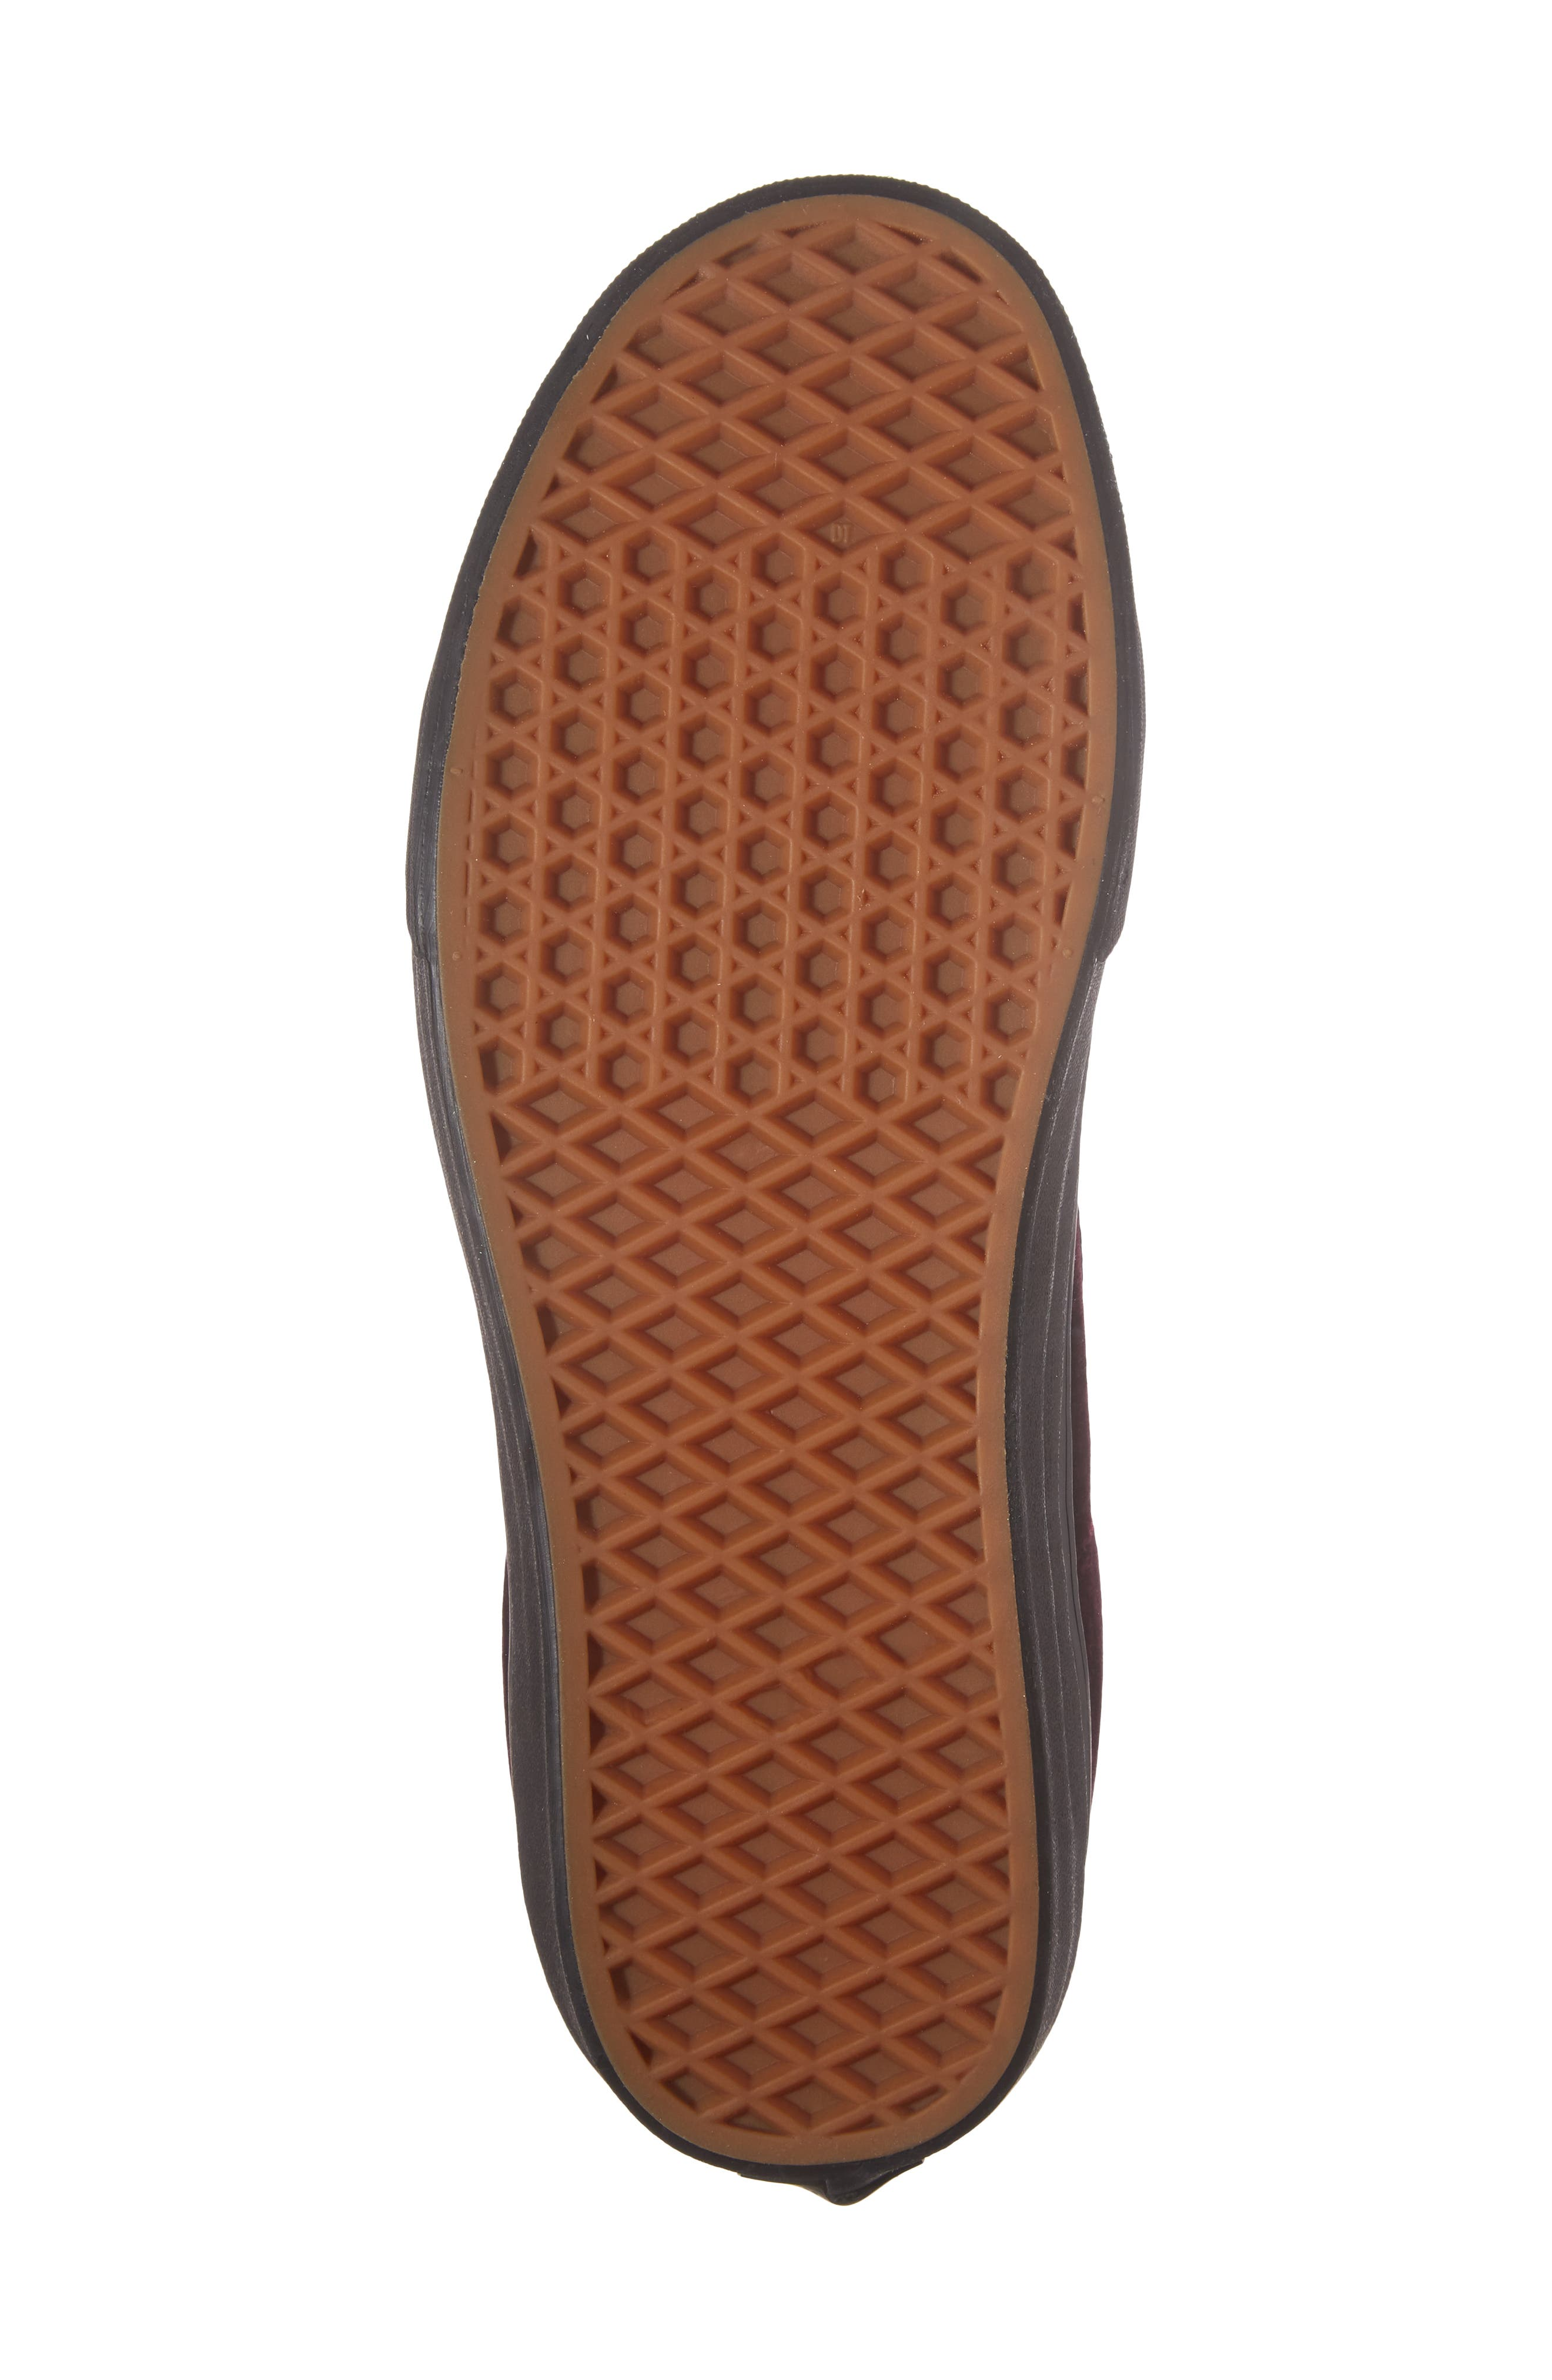 SK8-Hi Reissue High Top Sneaker,                             Alternate thumbnail 6, color,                             930